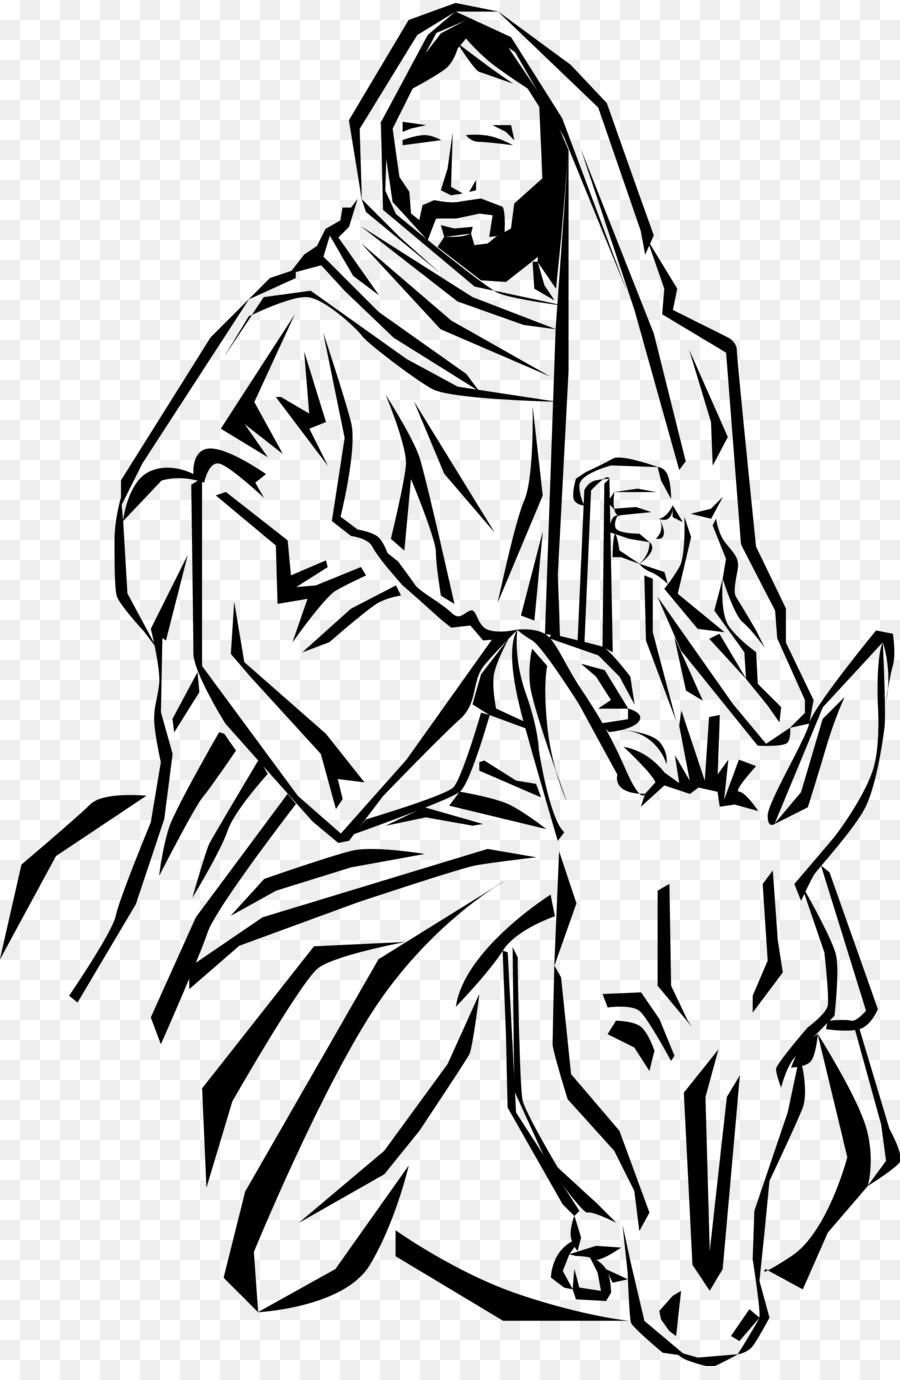 Jesus enters jerusalem black and white clipart jpg black and white Palm Sunday Donkey png download - 2175*3300 - Free Transparent ... jpg black and white